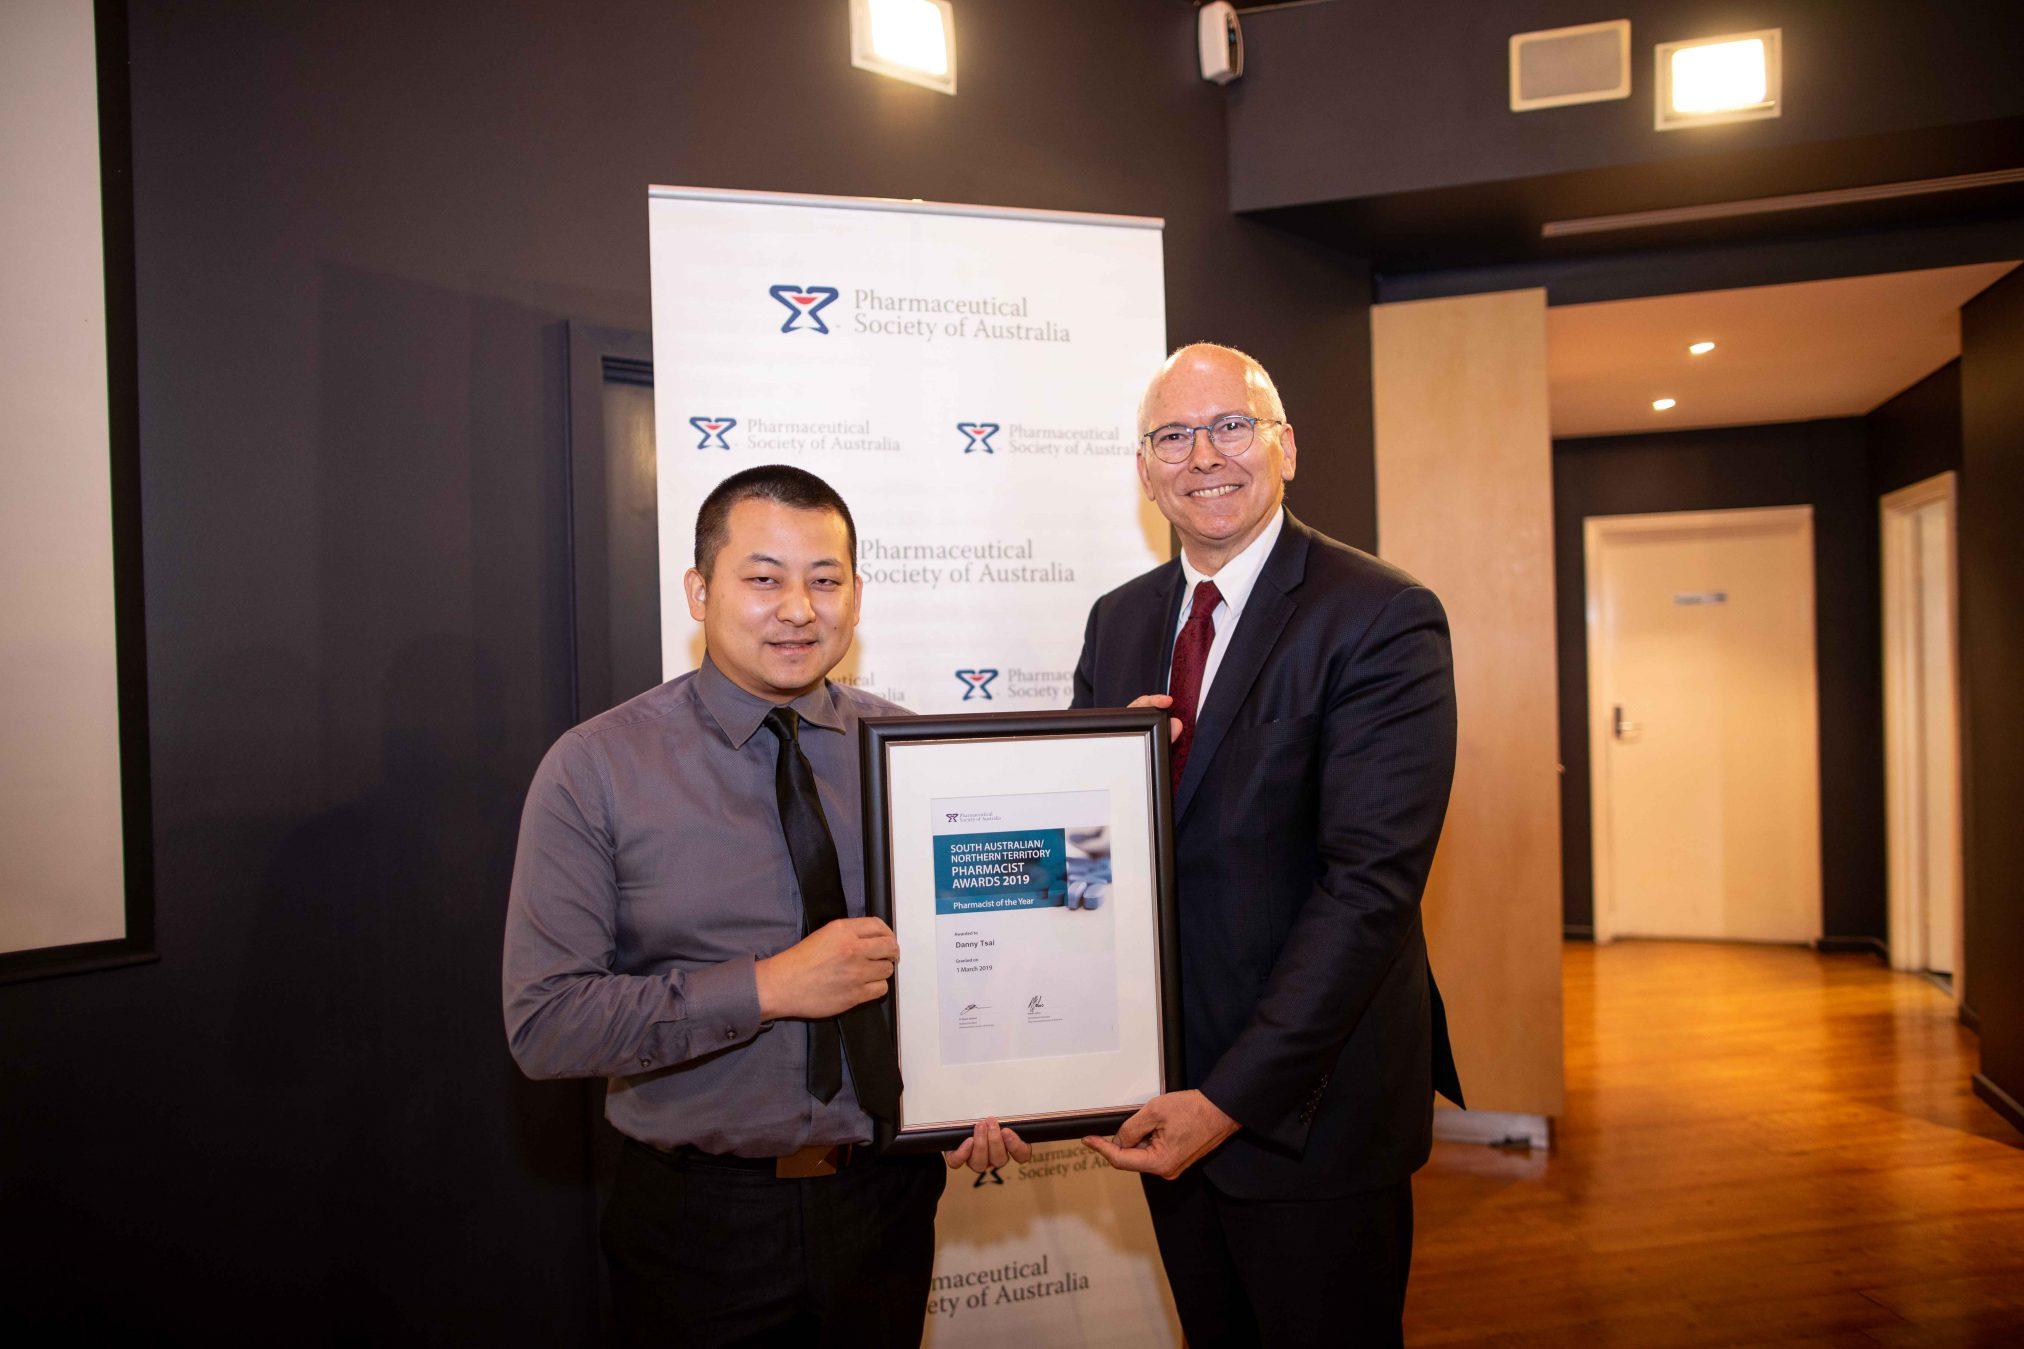 The Hon David Pisoni MP presents the SA/NT Pharmacist of the Year Award to Dr Danny Tsai